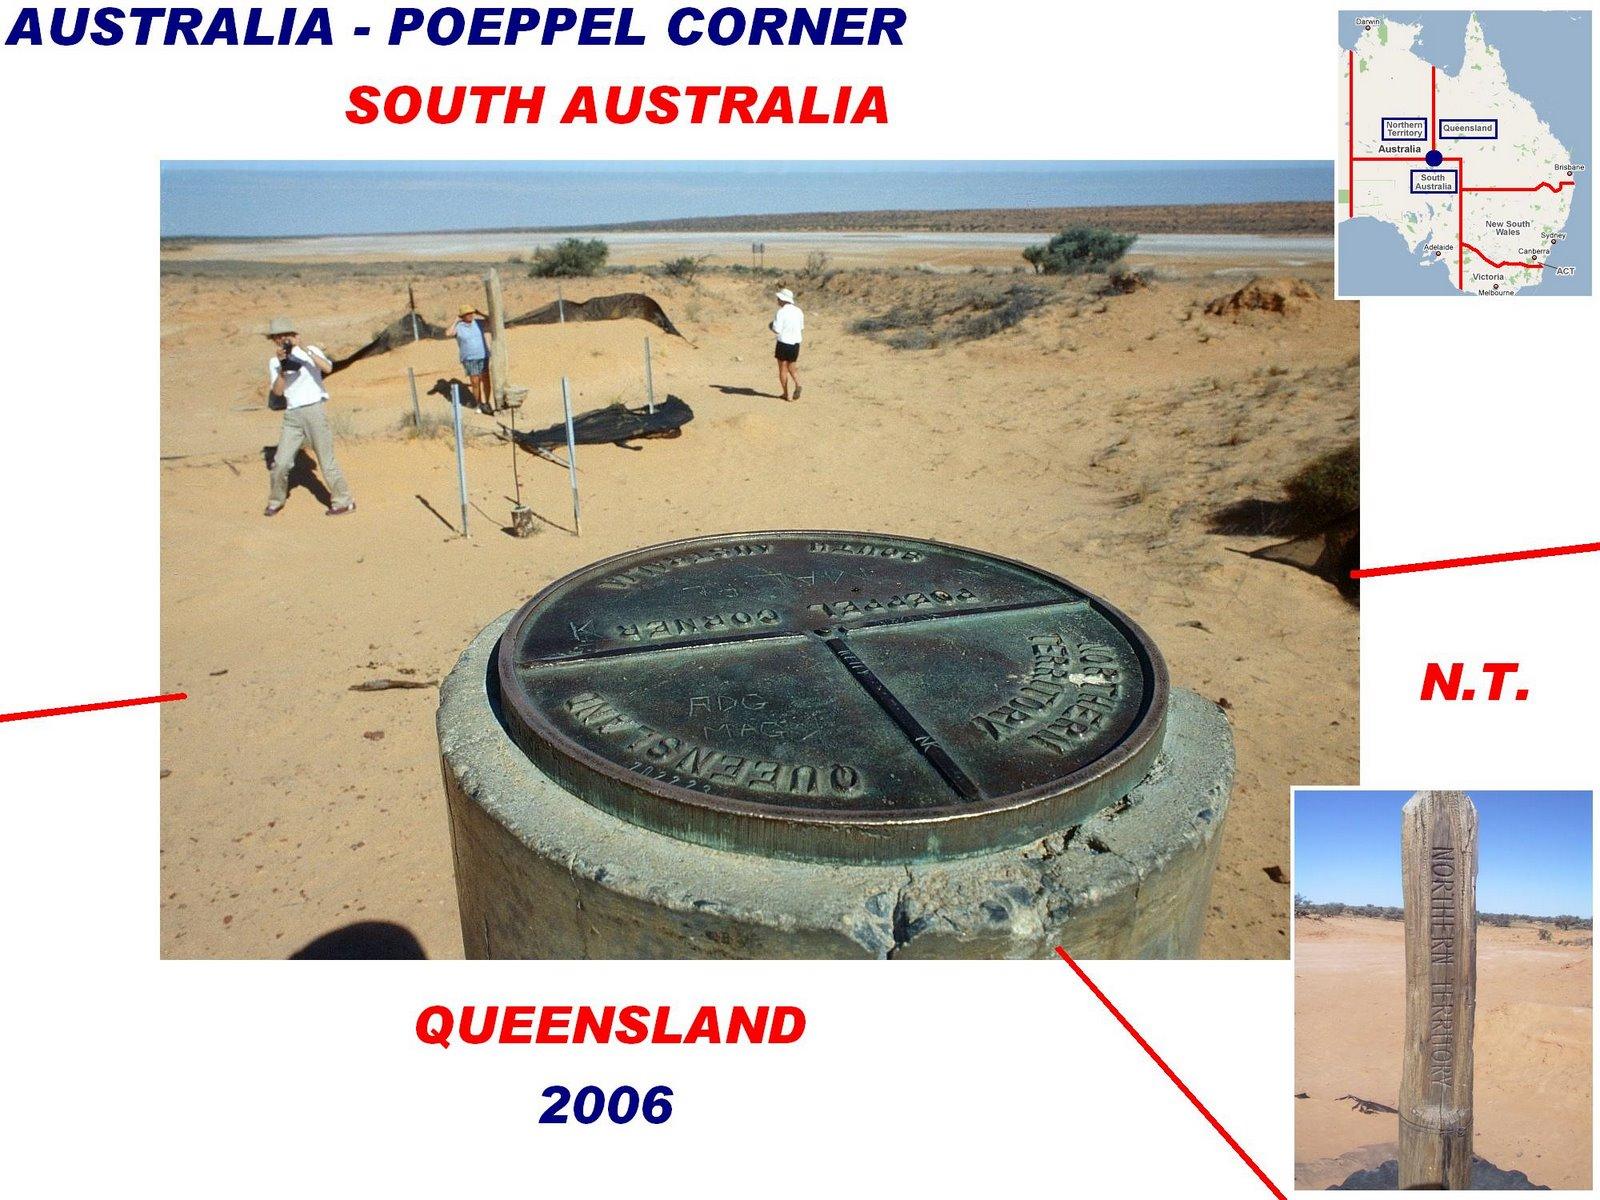 http://1.bp.blogspot.com/_ipD3p4pEVxM/SlI9VQijWjI/AAAAAAAACdI/5bmBnsRZliE/s1600/CONFINE+AUSTRALIAN-AUSTRALIAS-QUEENSLAND+2006+20090706.jpg